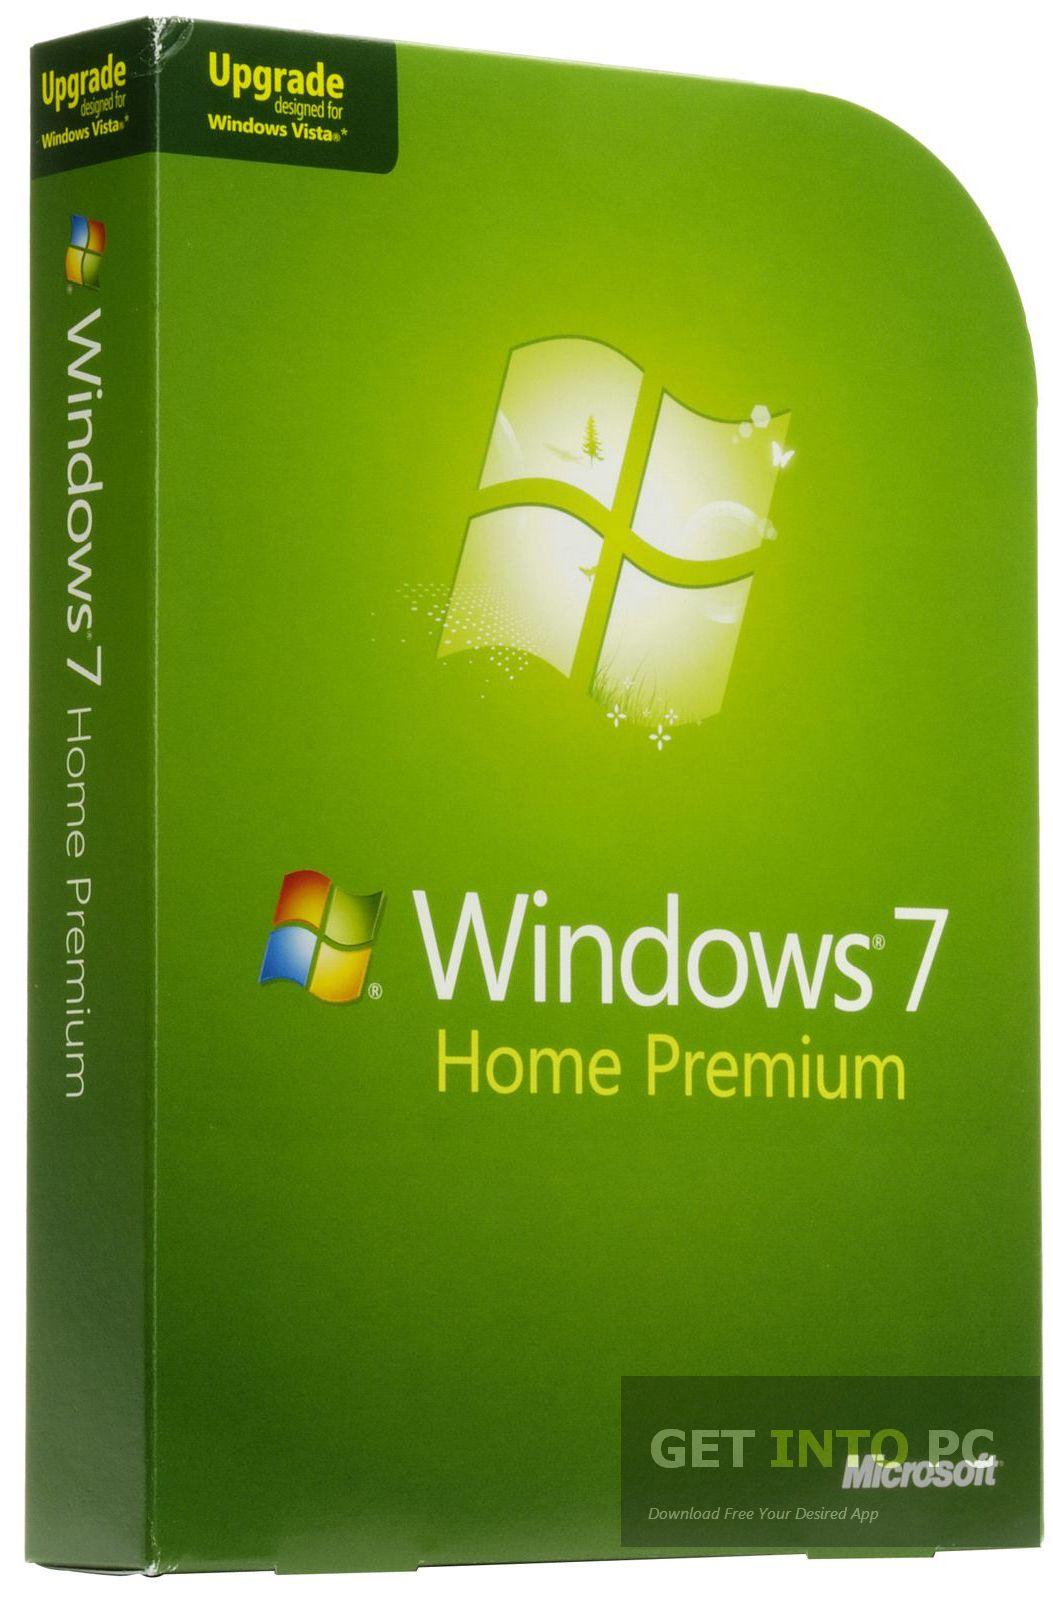 Windows 7 Home Premium Free Download ISO 32 Bit 64 Bit ...